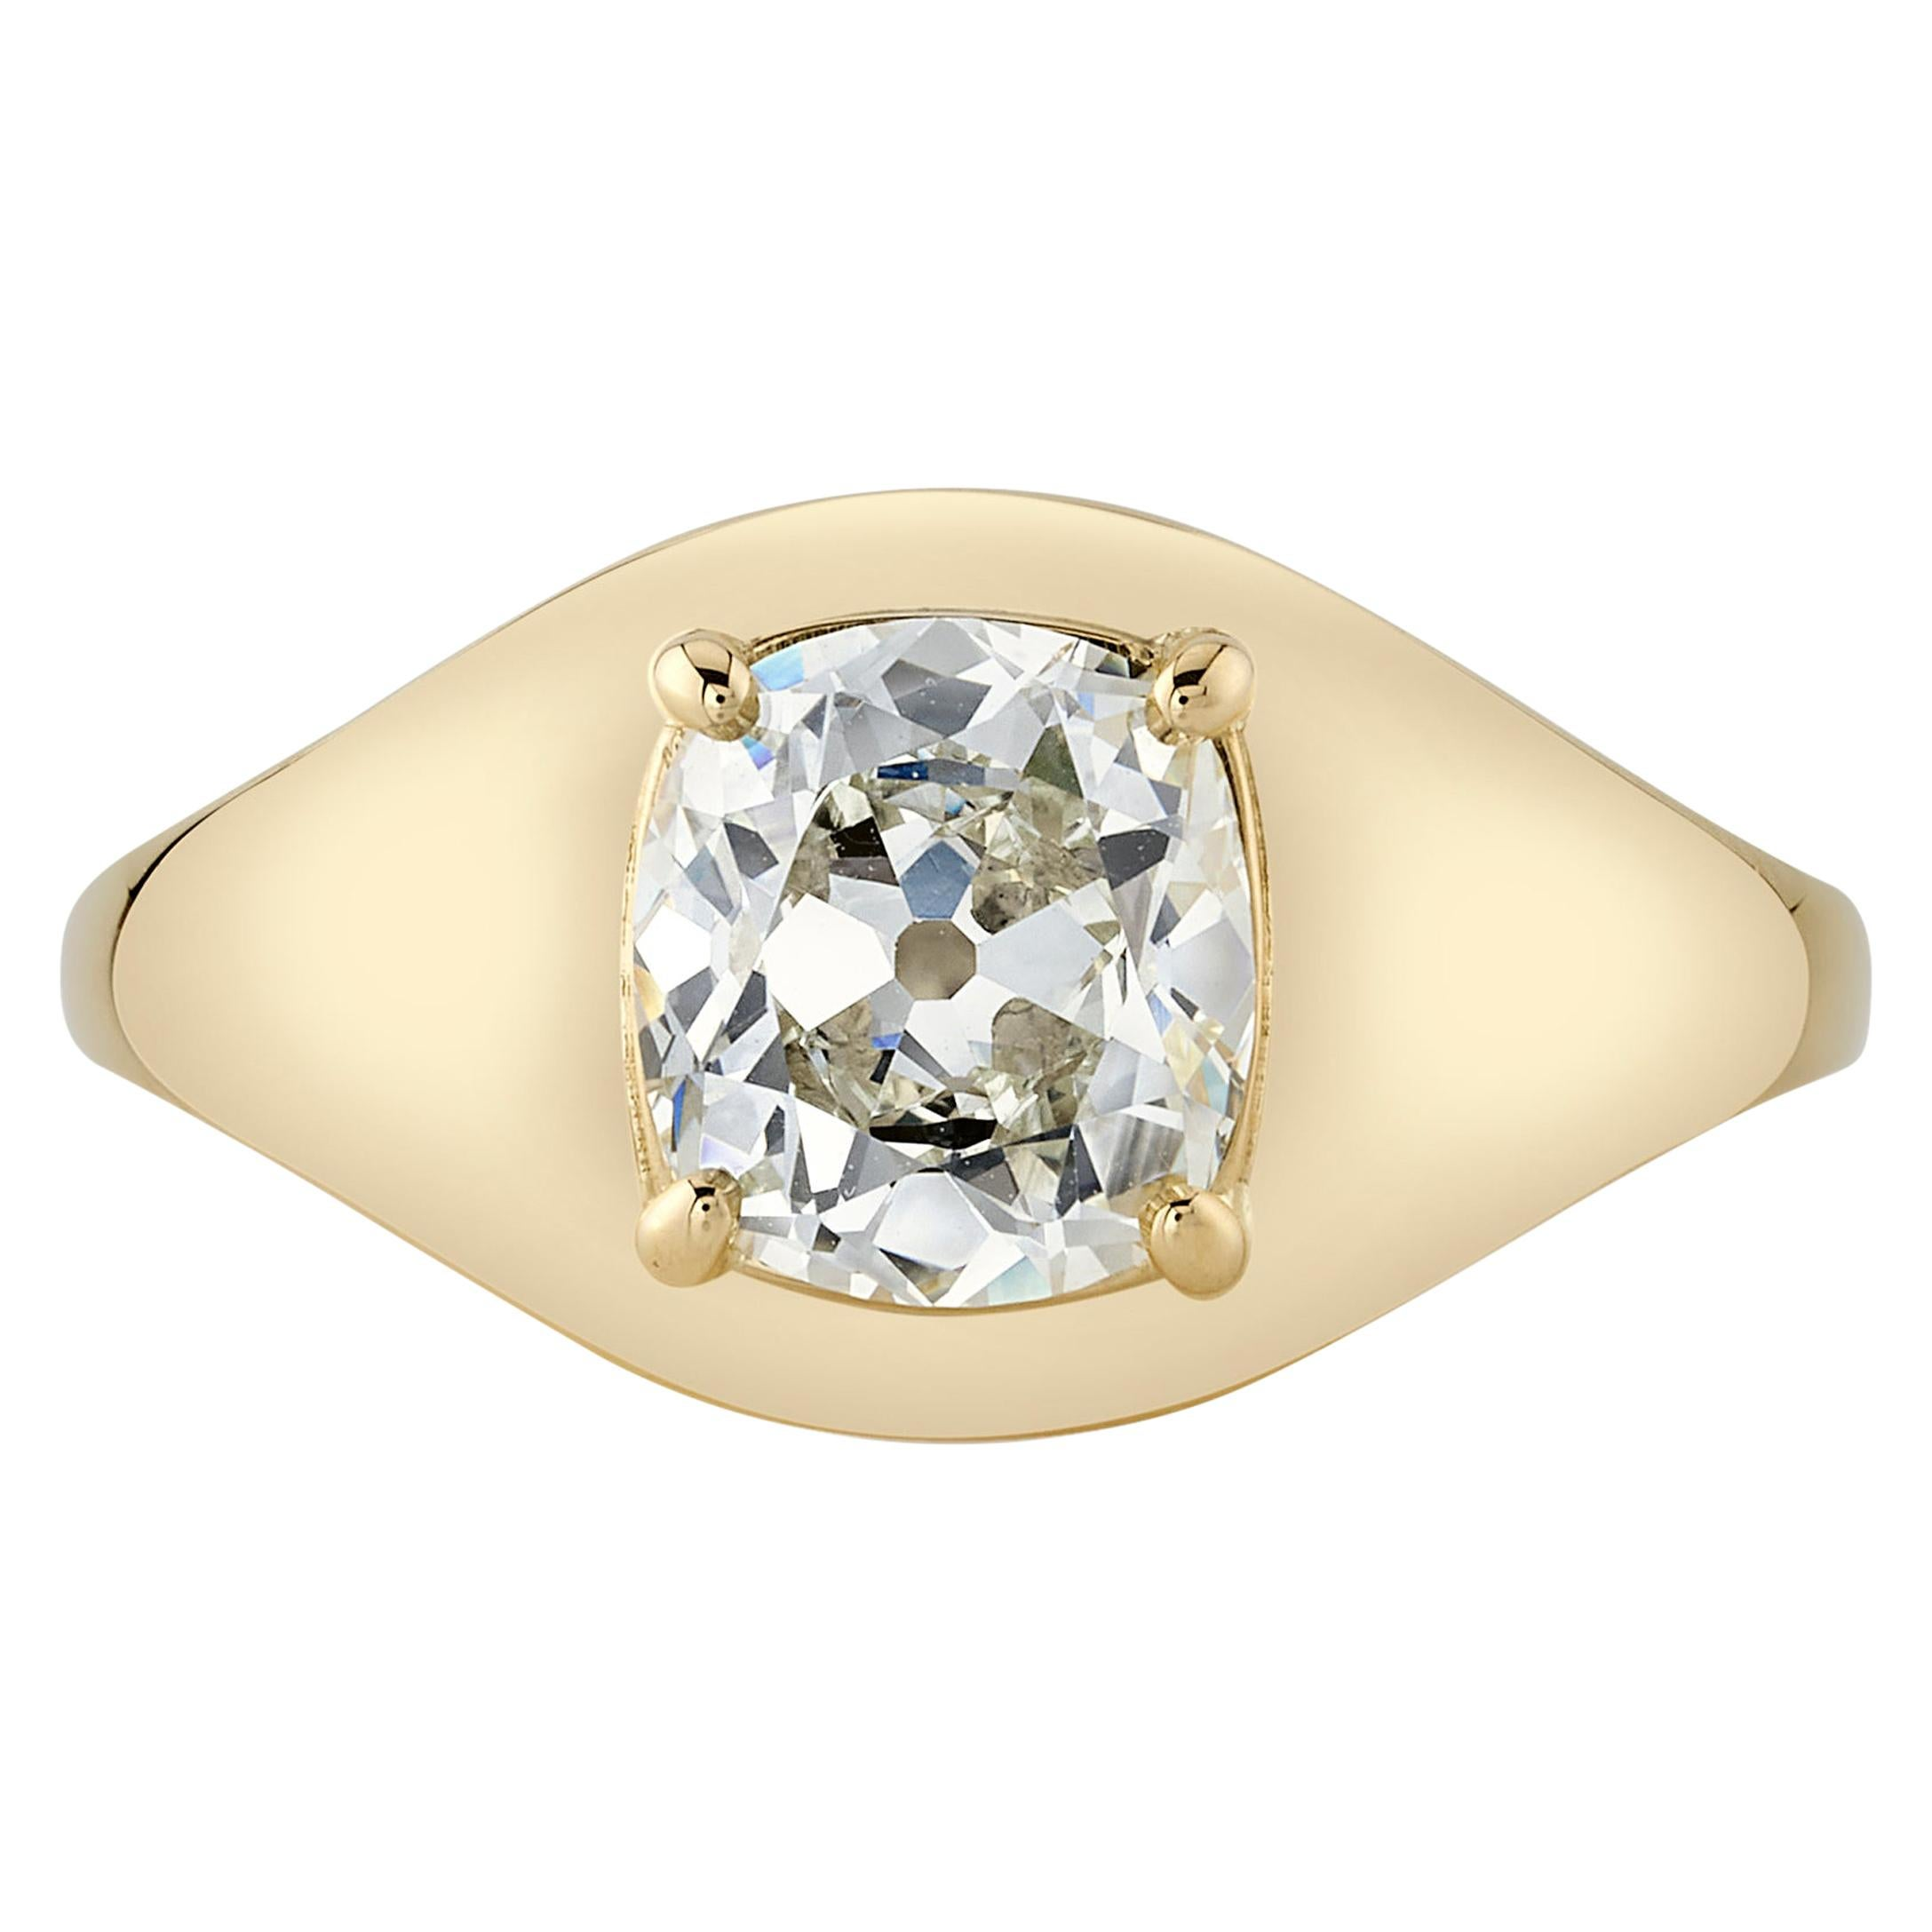 Handcrafted Bryn Antique Cushion Cut Diamond Ring by Single Stone